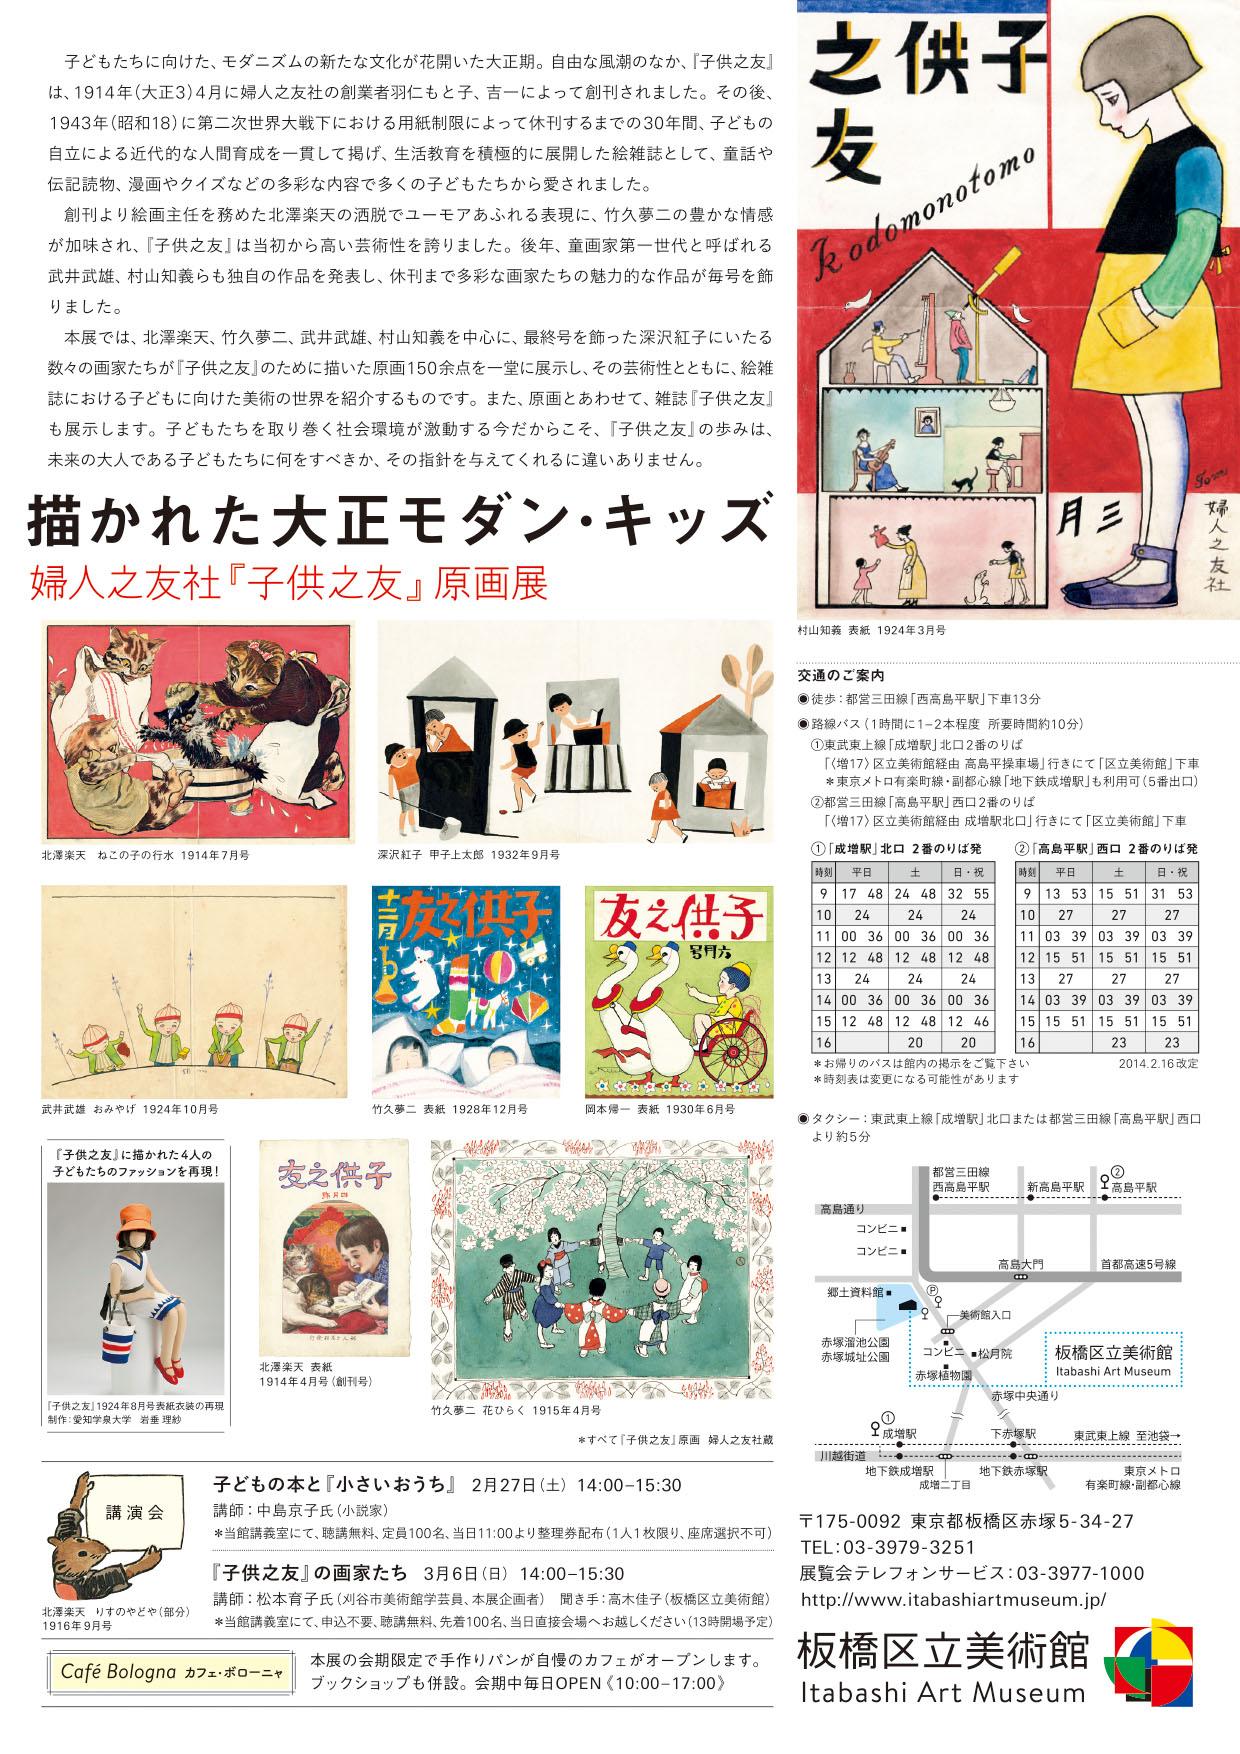 A4-ura_itabashi_0